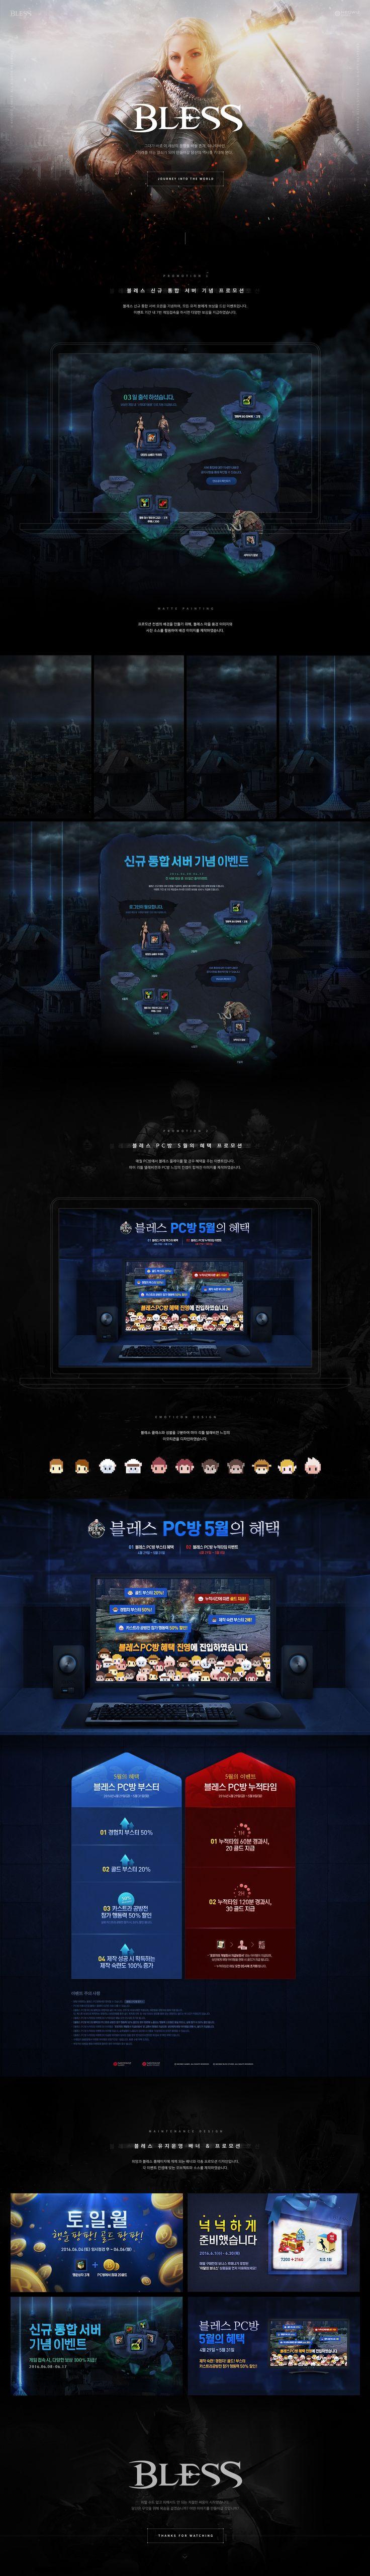 Neowiz Games – Bless Promotion Design